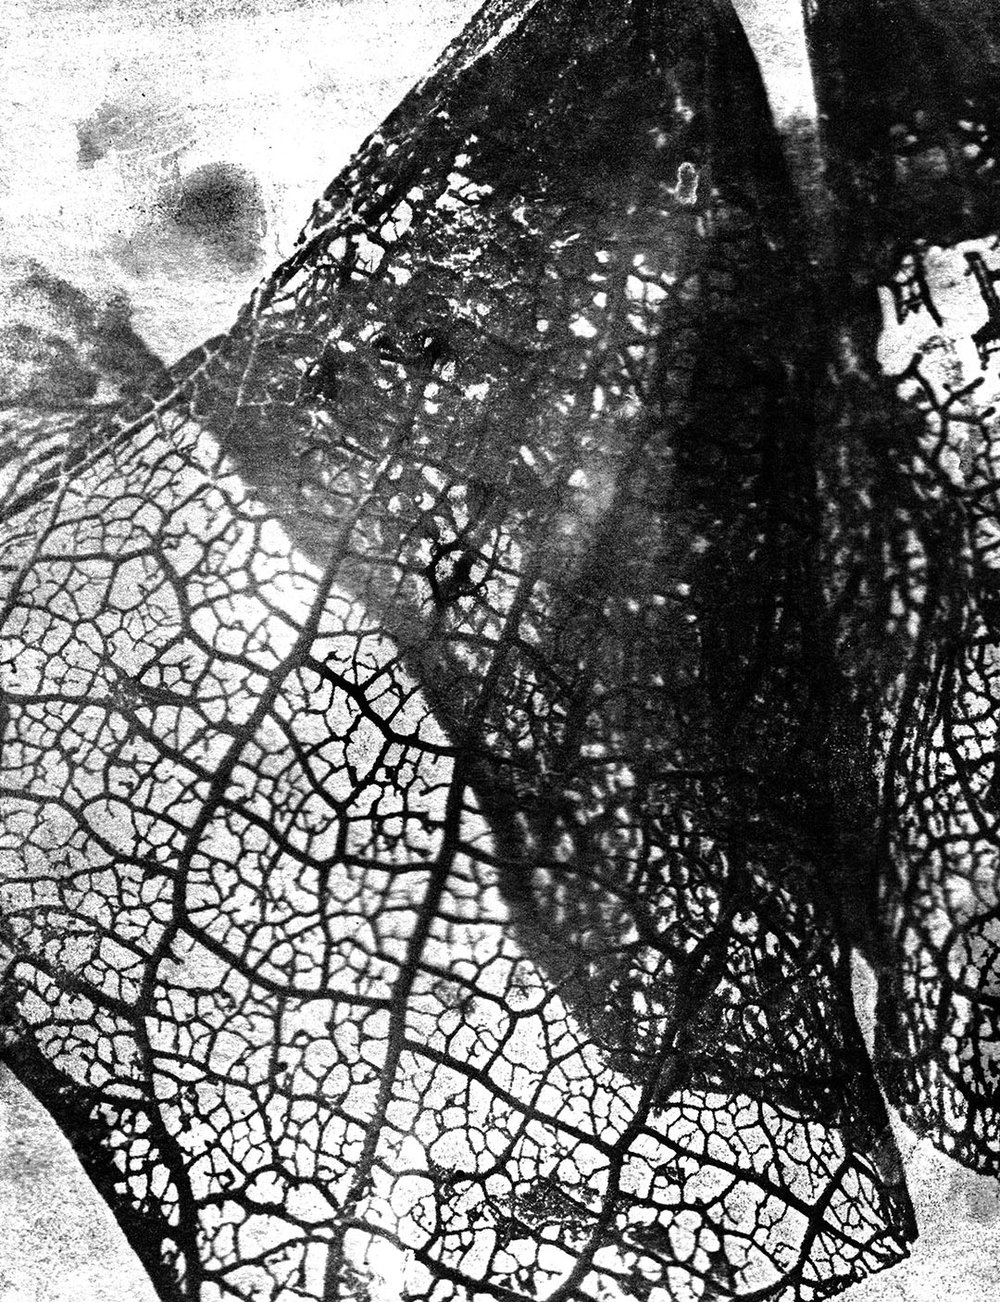 Negative Leaf